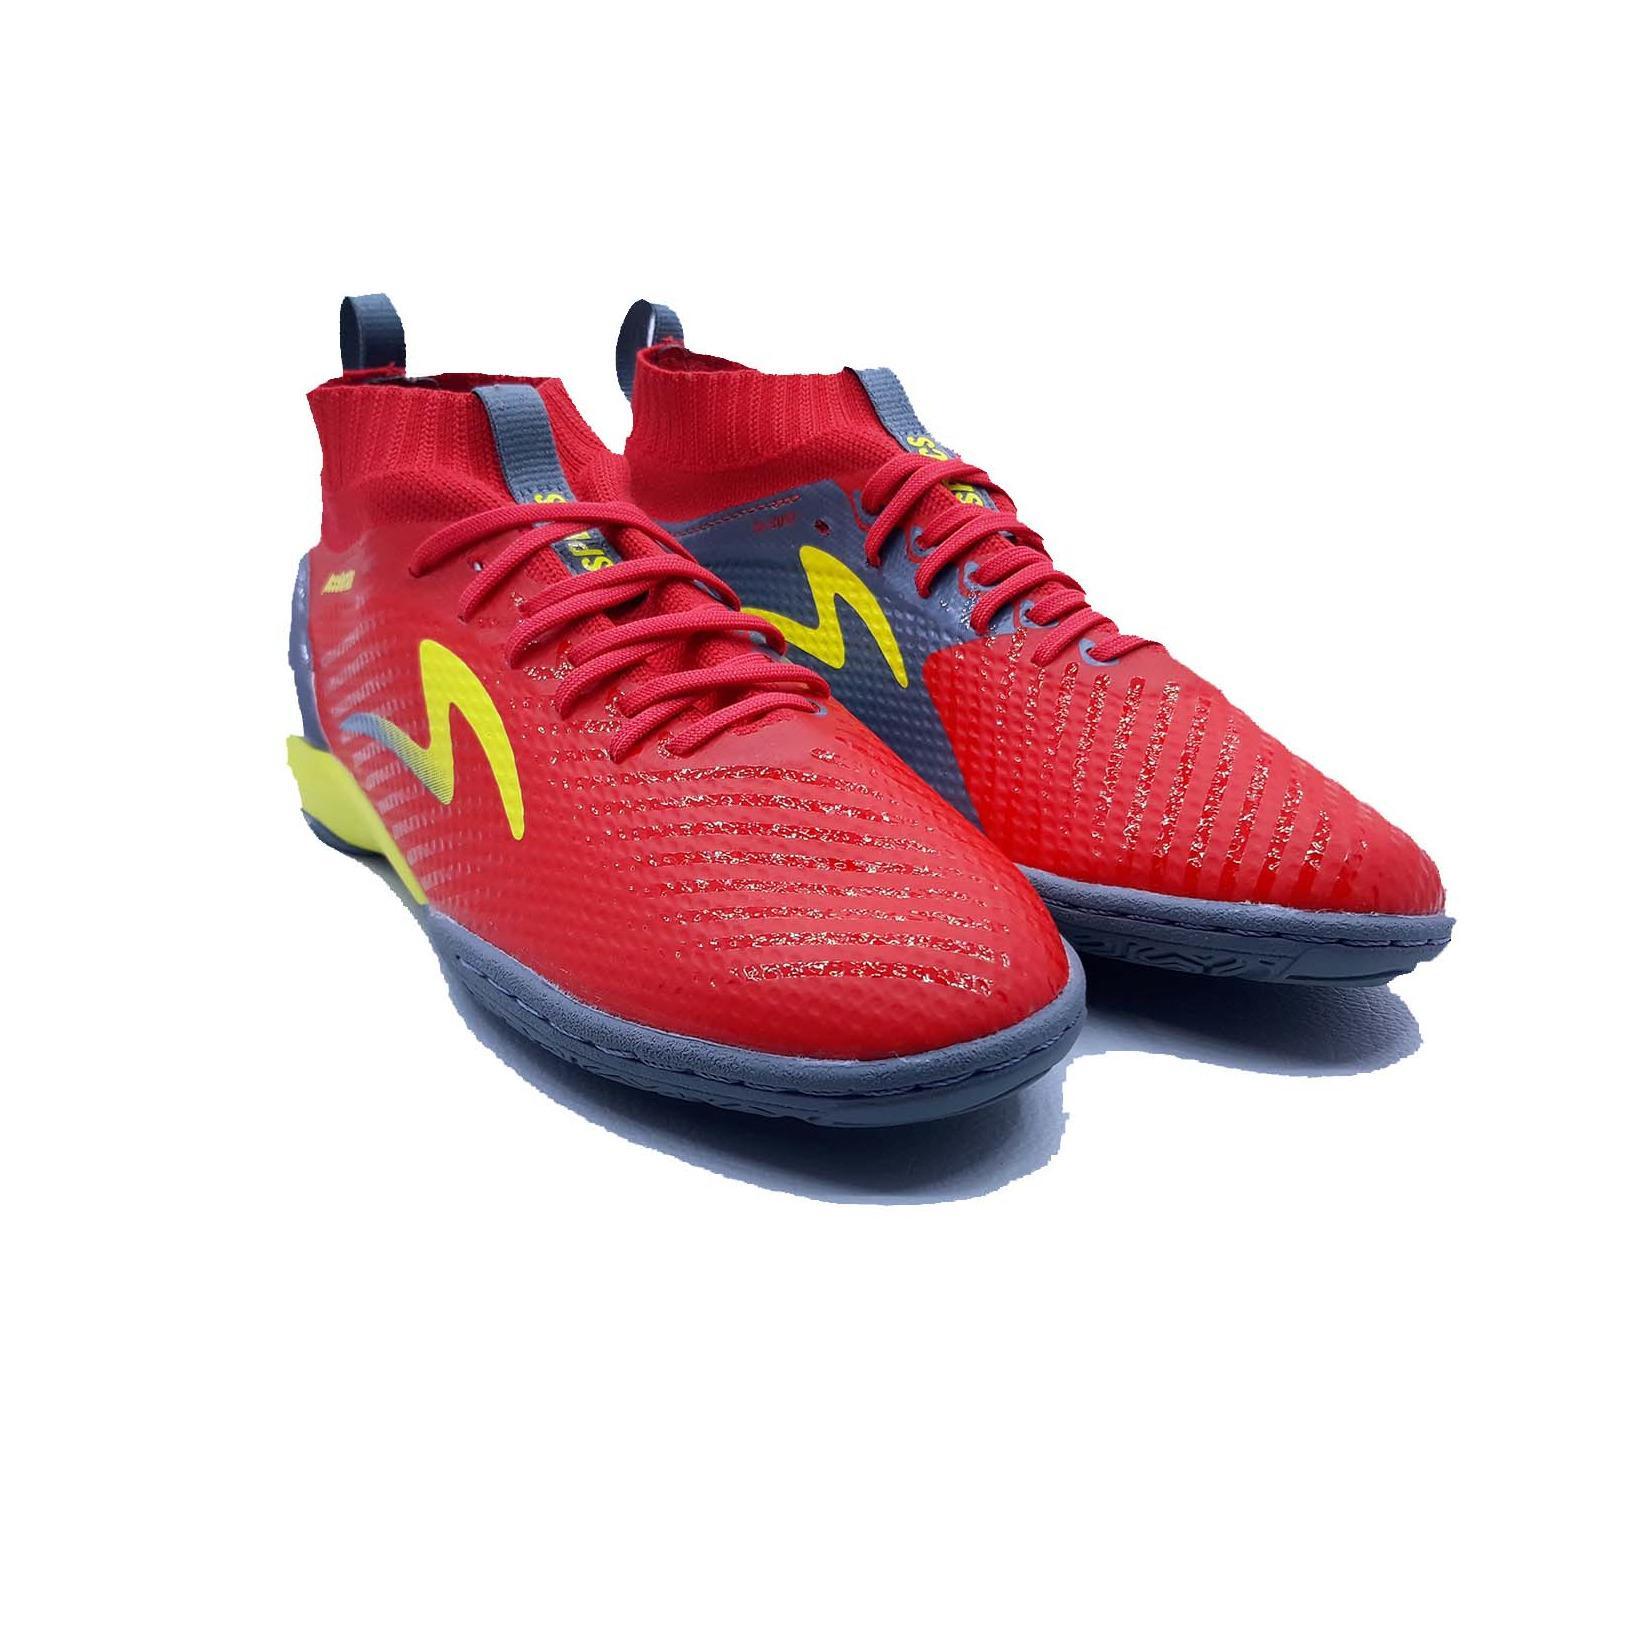 Sepatu Olahraga Futsal Pria Specs Accelerator Infinity in - Emperor Red Dark  Granite Fresh Yellow e5136b60e2